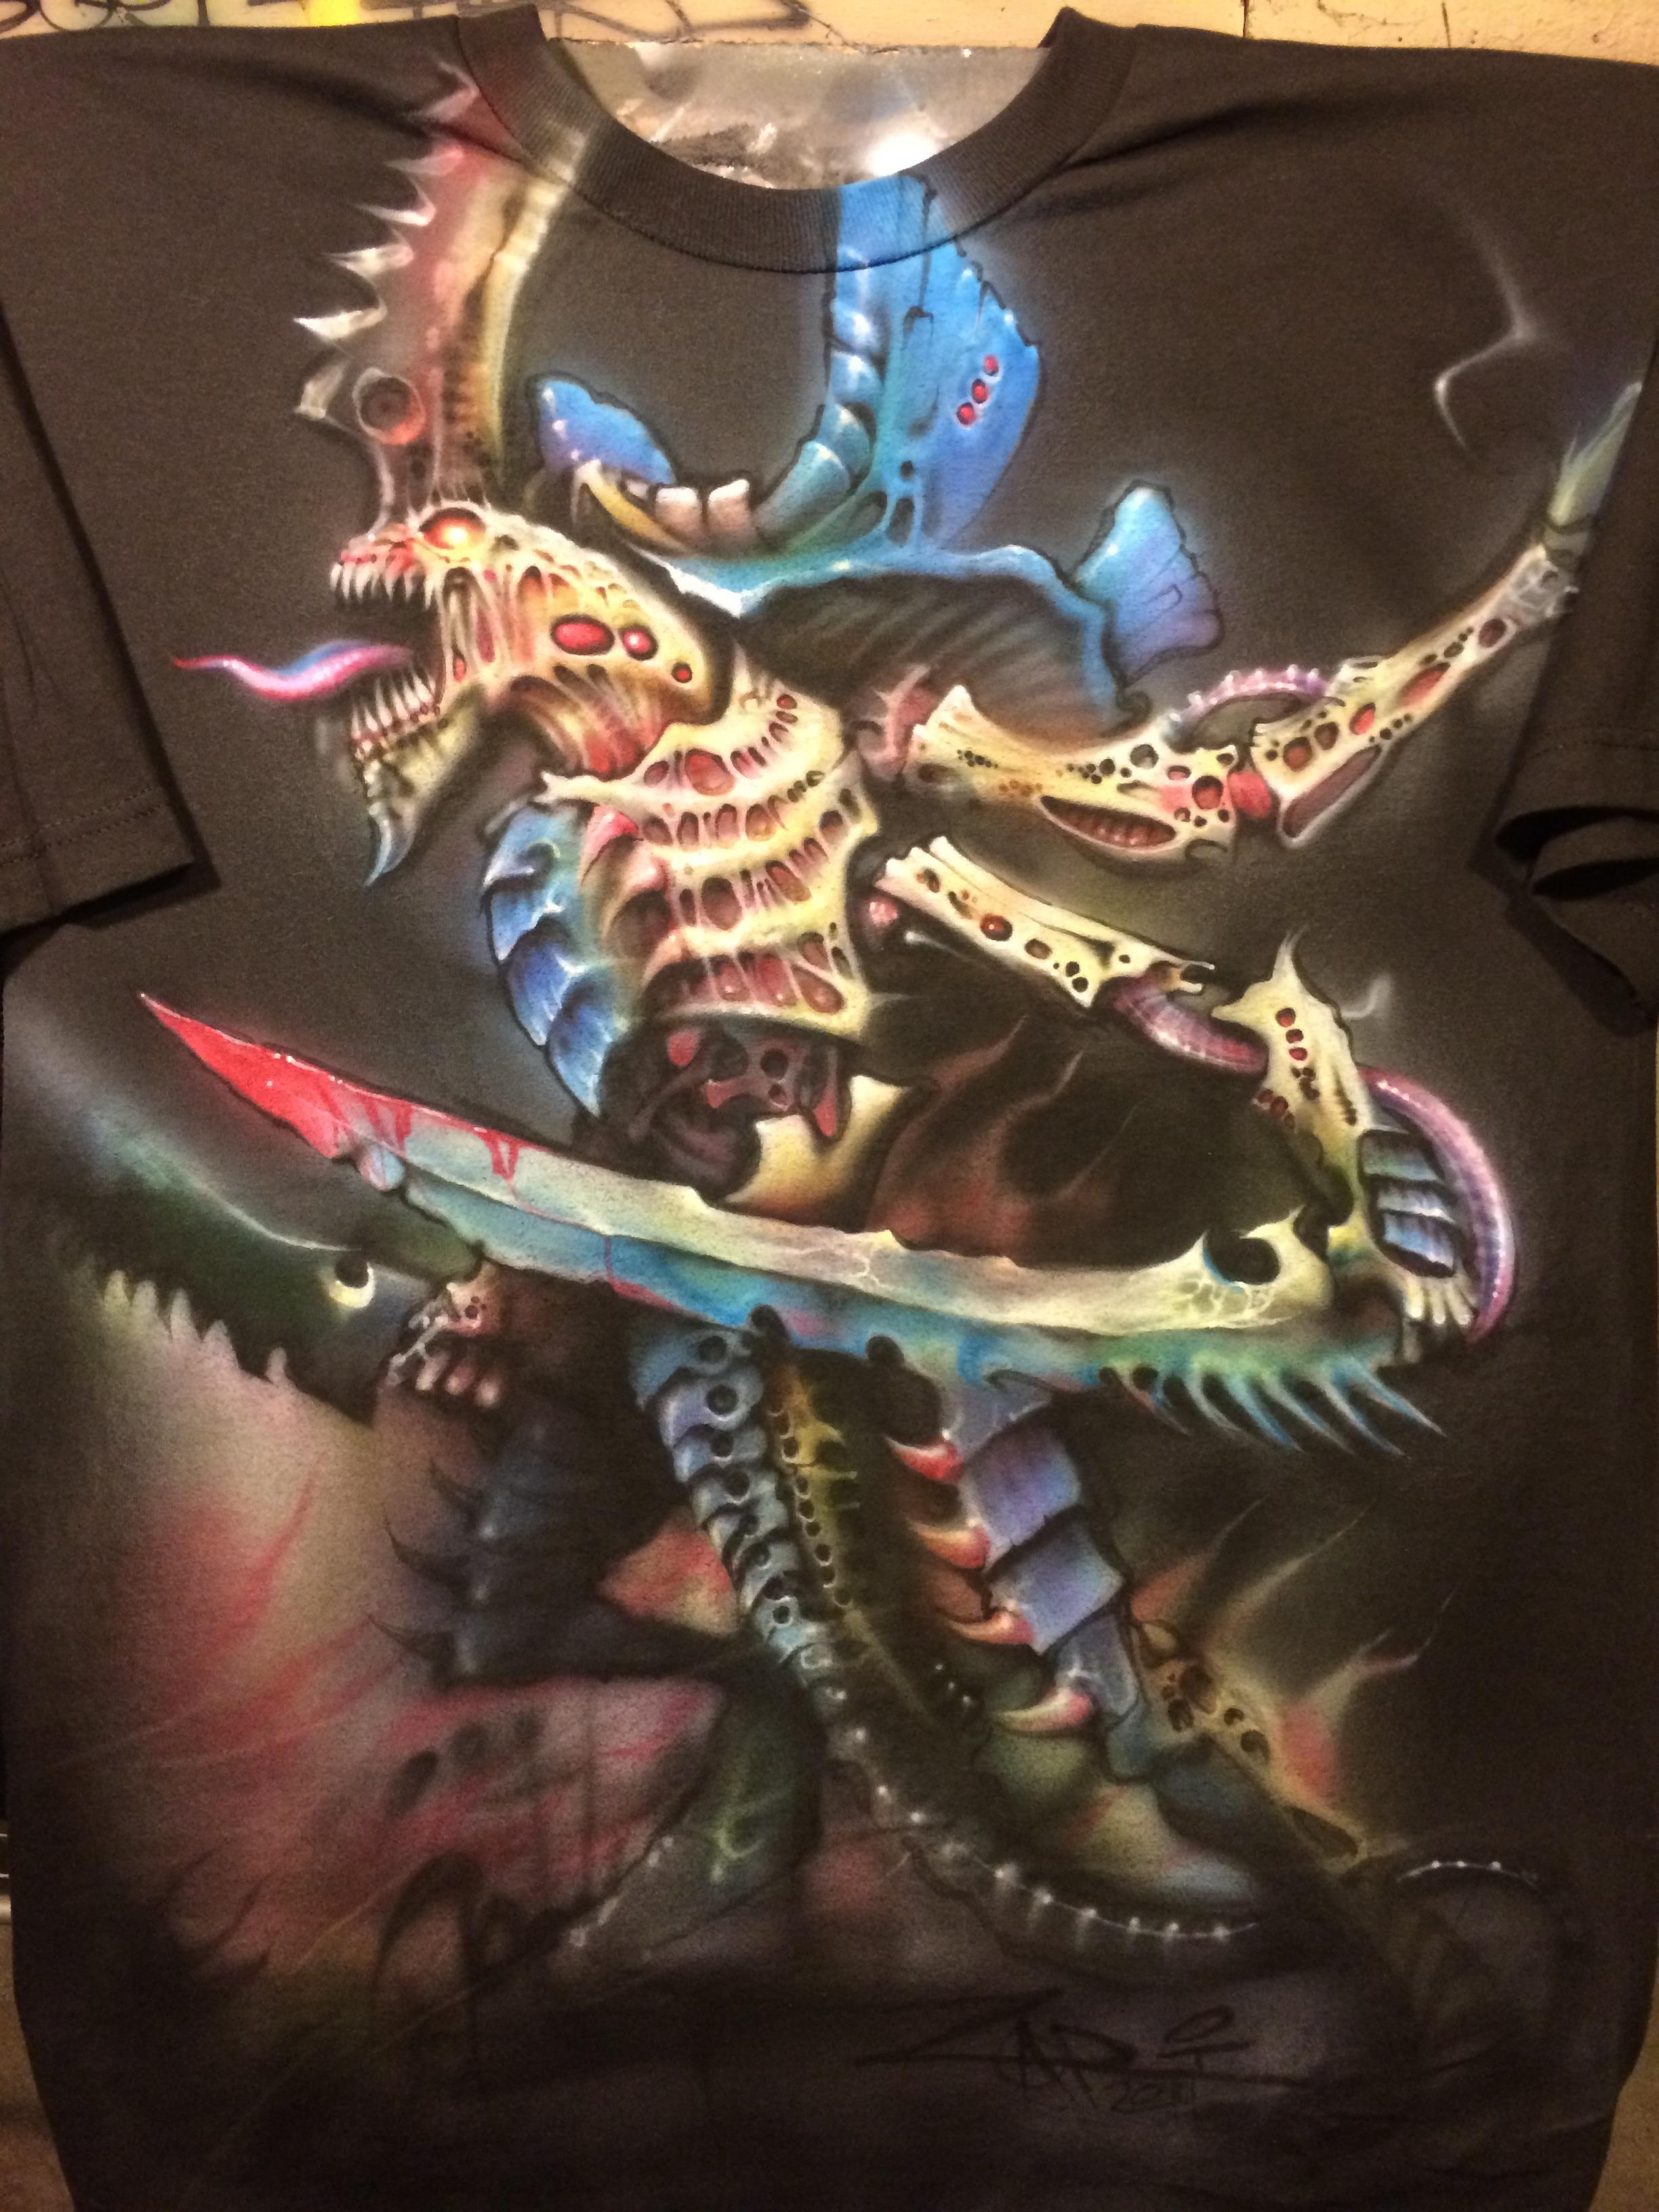 Airbrushed, Hive, Swarm Lord, T Shirt, Tyranids, Warhammer 40,000